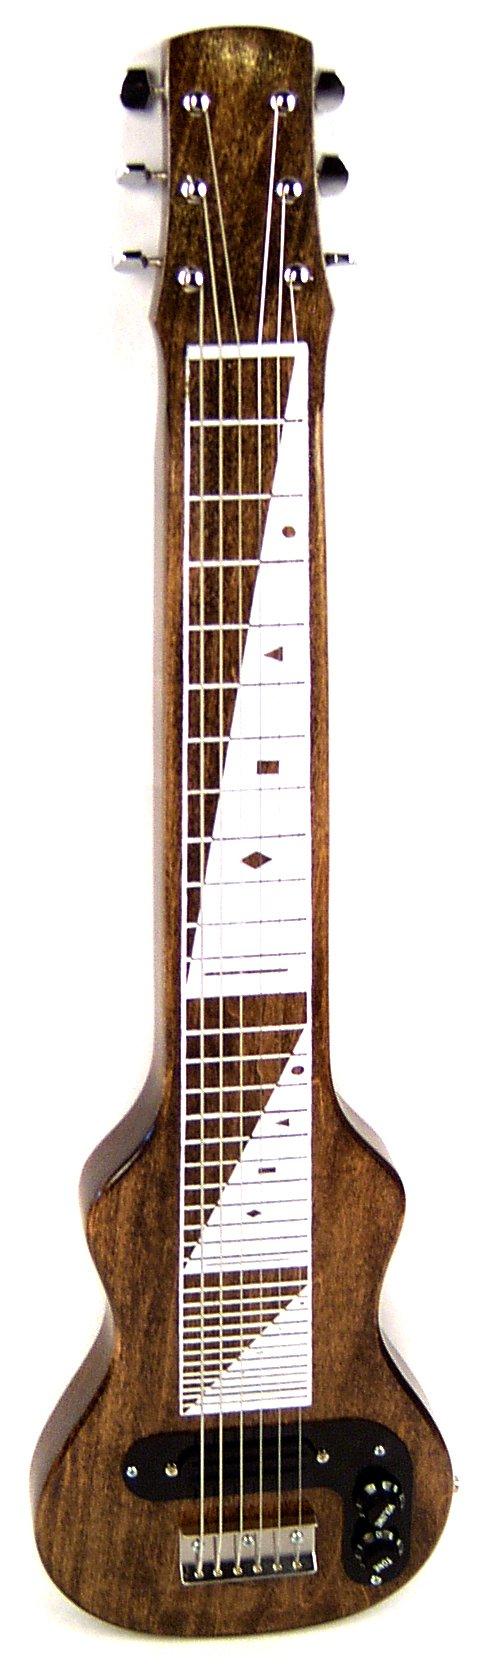 Morrell JM Pro Poplar Body 6-String Lap Steel-Vintage Brown